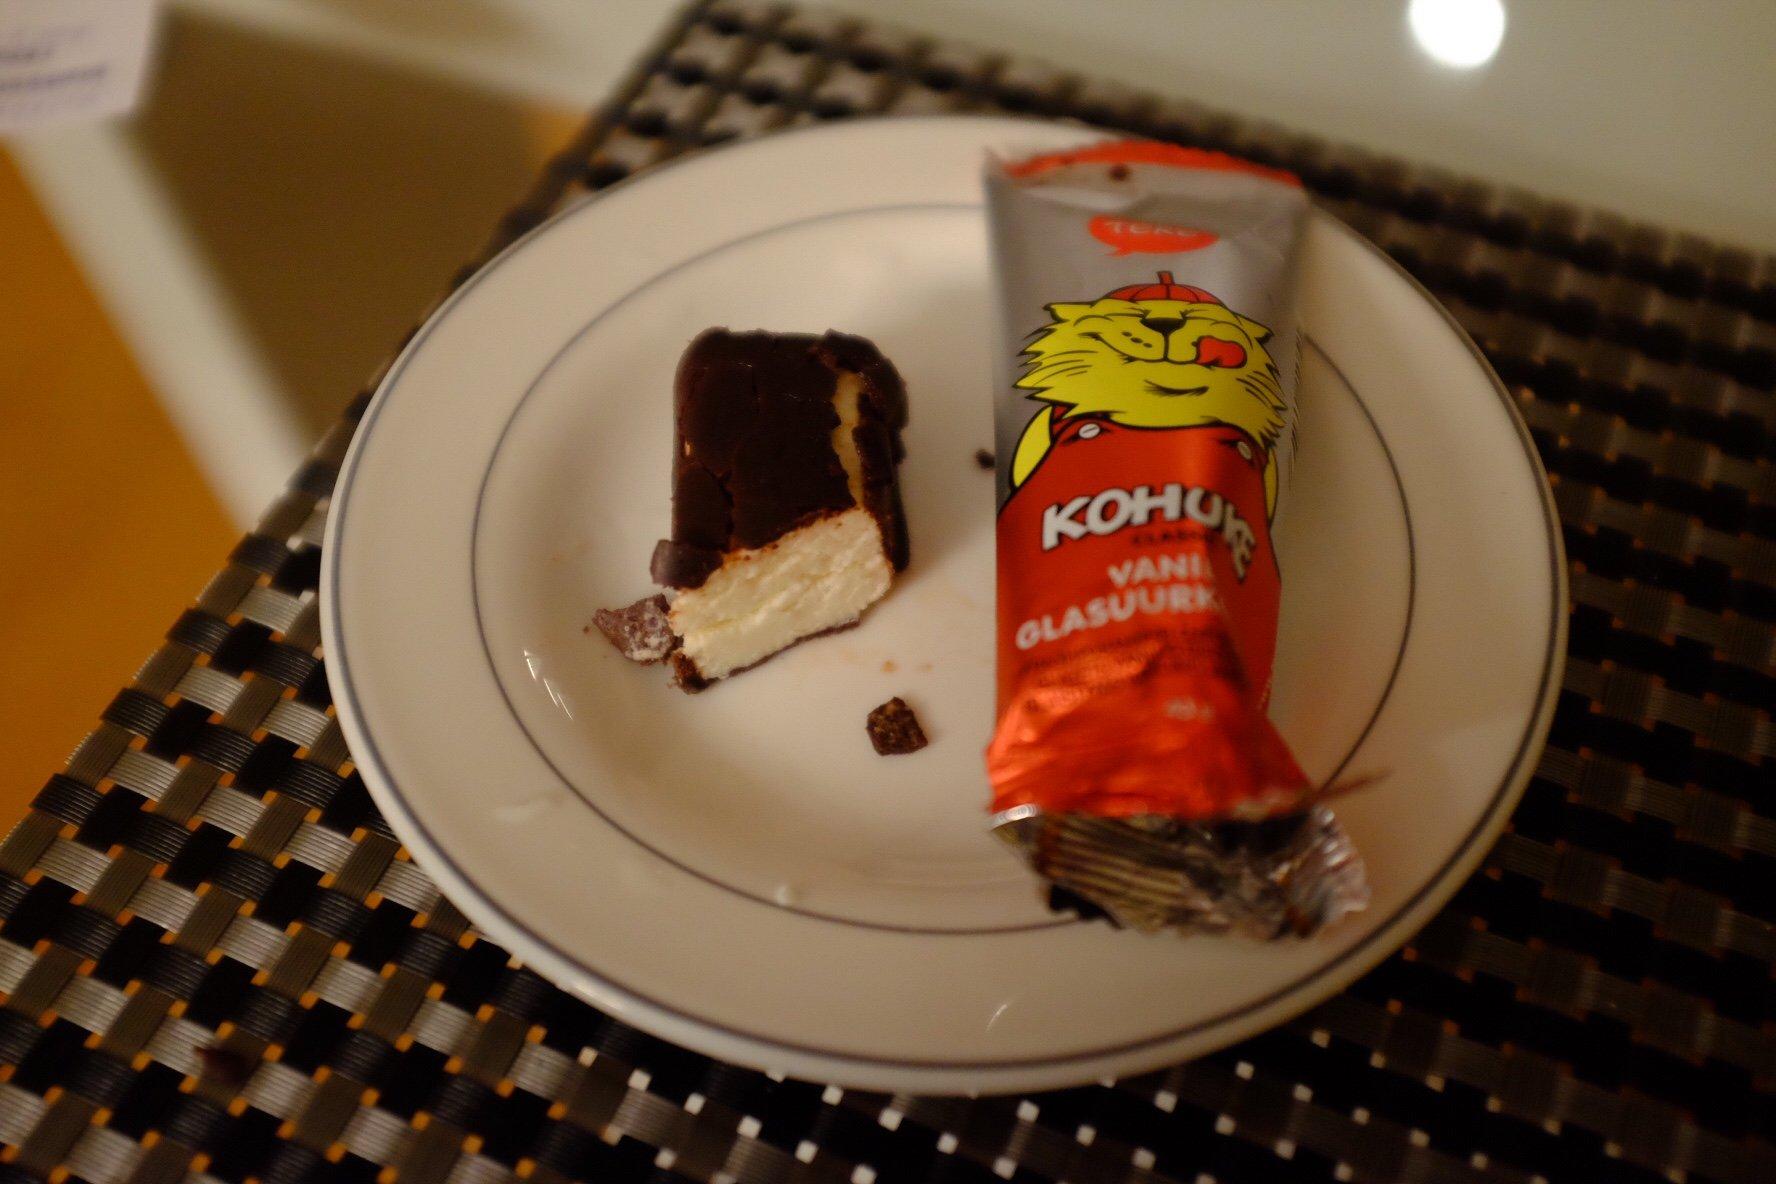 Kohuke is a popular sweet snack in Tallinn and all of Estonia